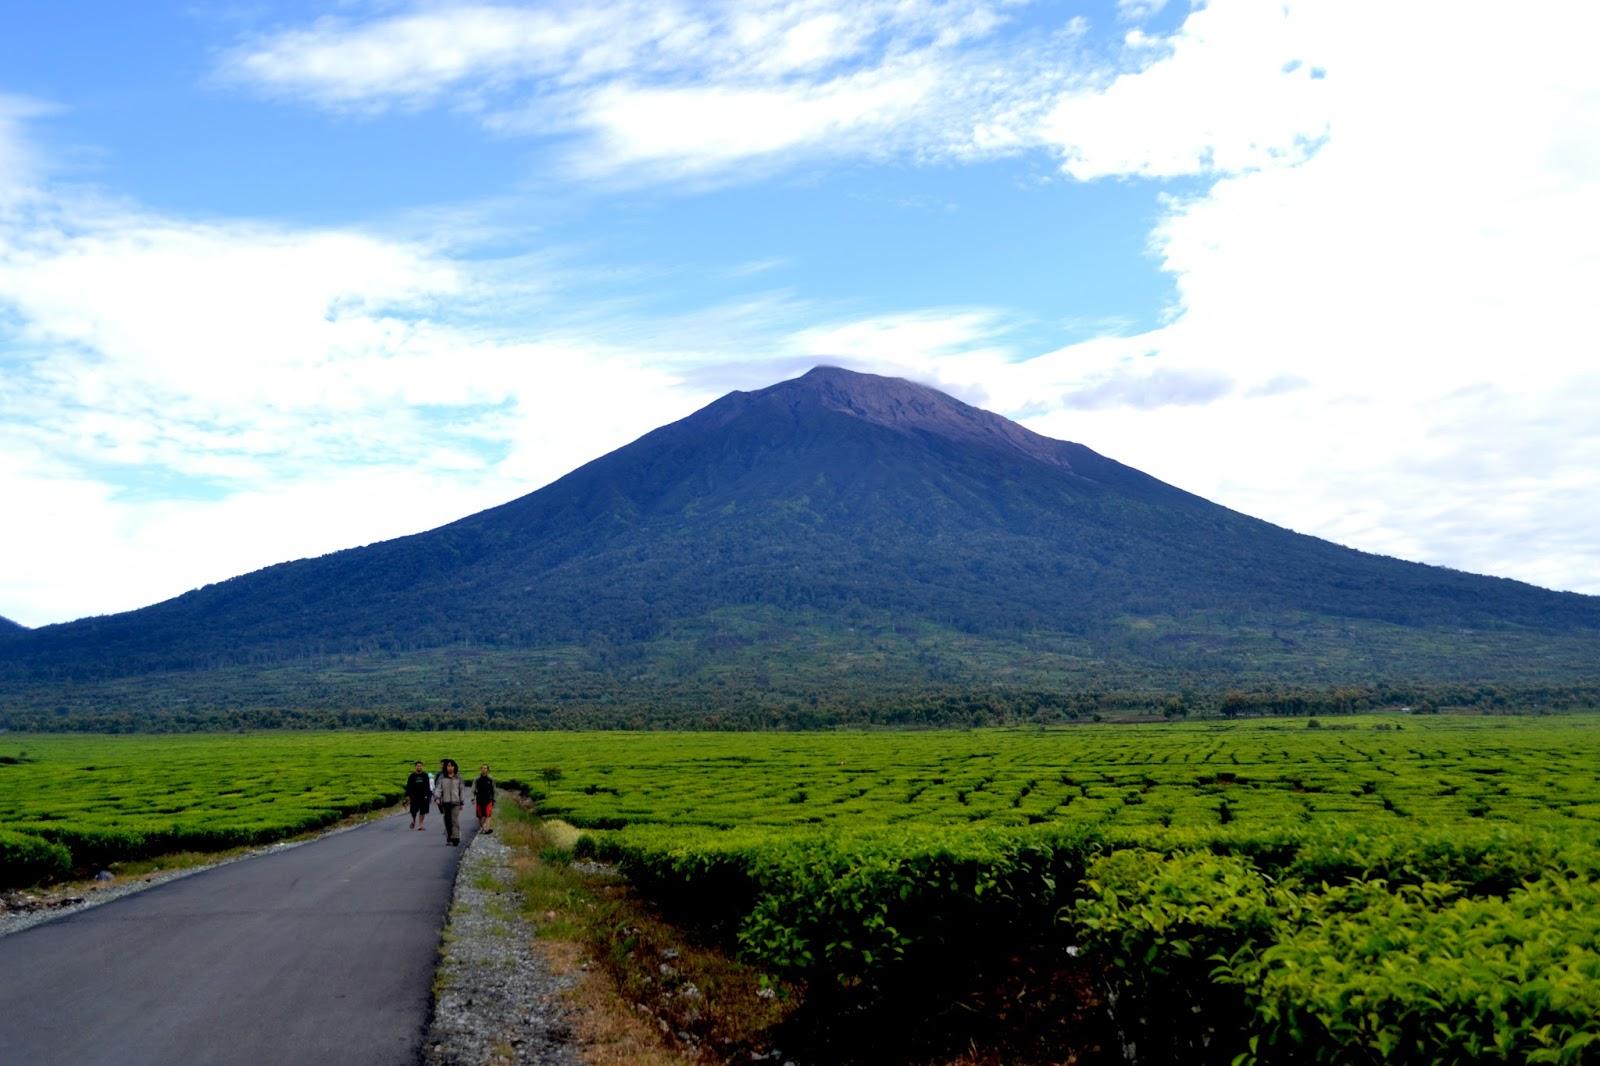 Pendakian Gunung Ciremai via Palutungan  Petaniadv  PETANI ADV  wisata alam gunung kota